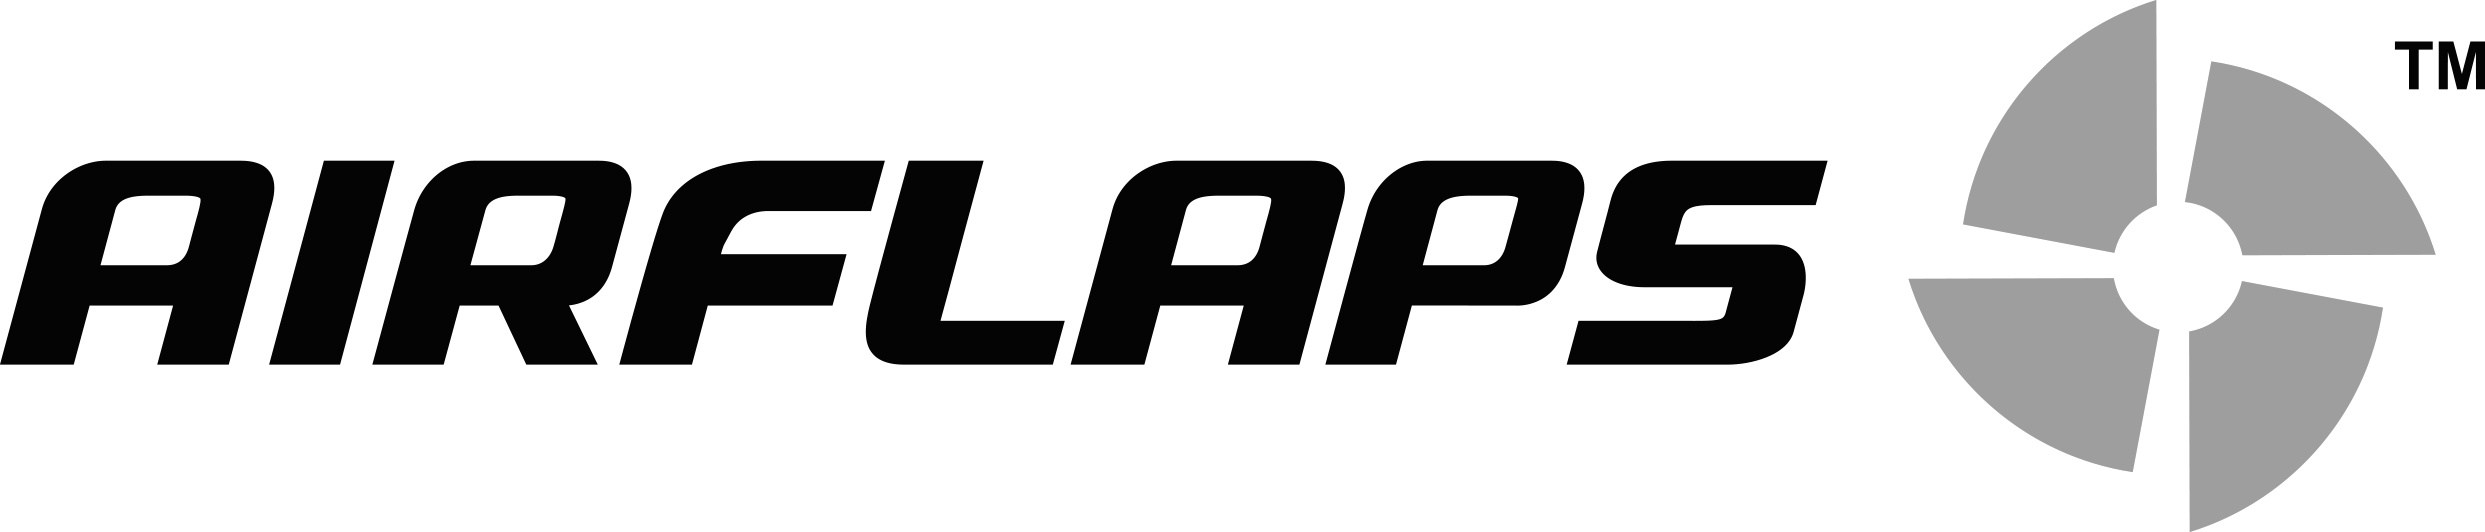 Airflaps